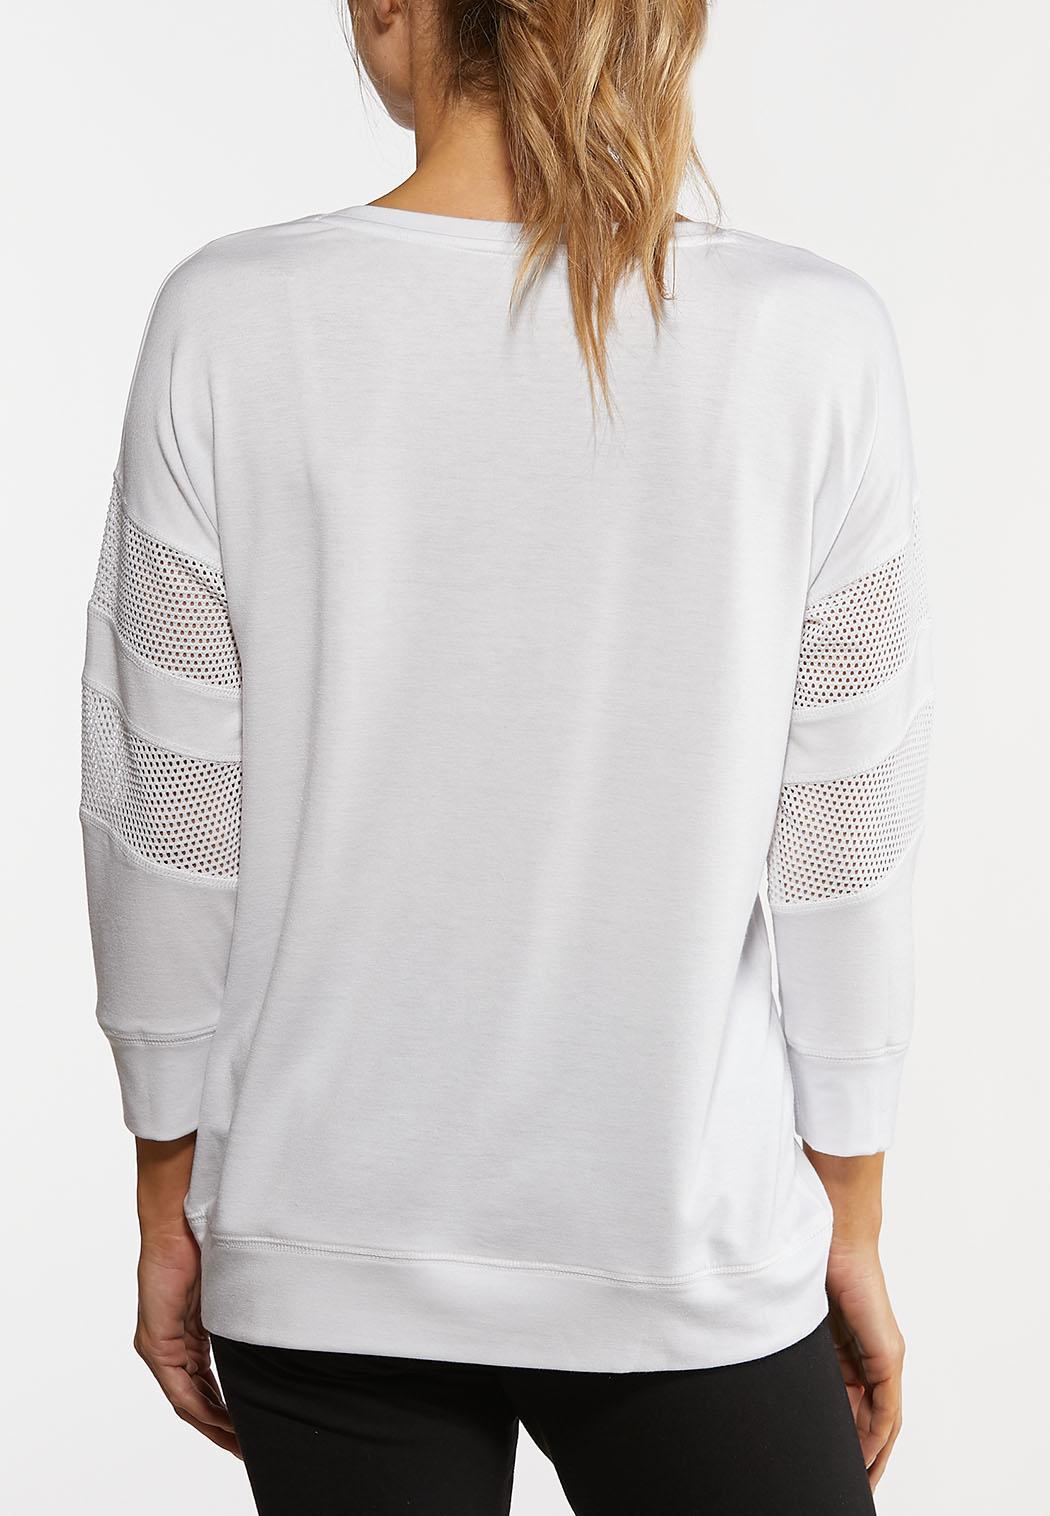 Plus Size Mesh Sleeve Active Top (Item #44167921)